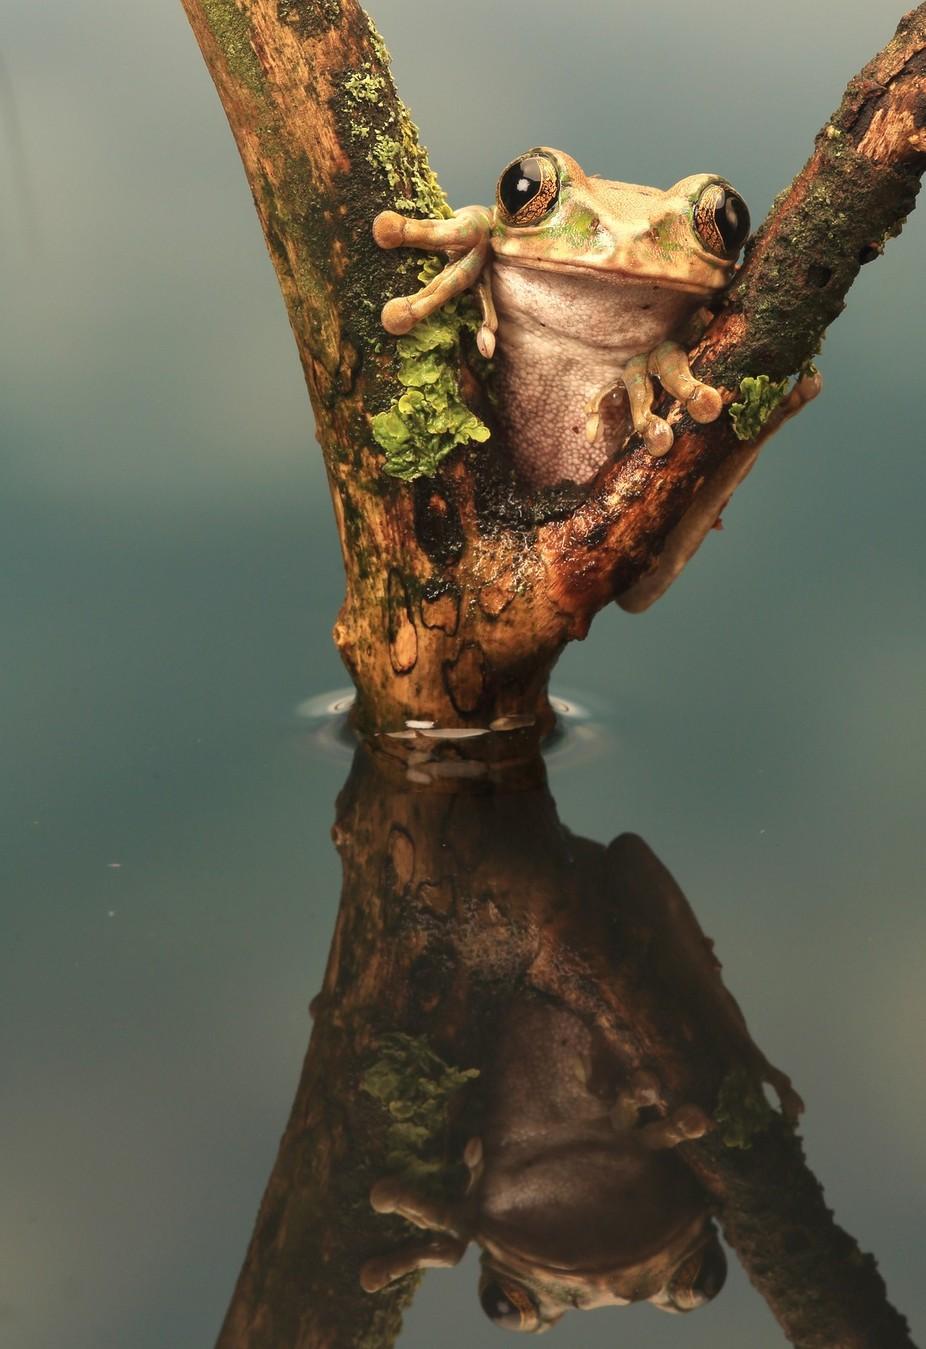 Peacock Tree Frog by ceridjones - Reptiles Photo Contest